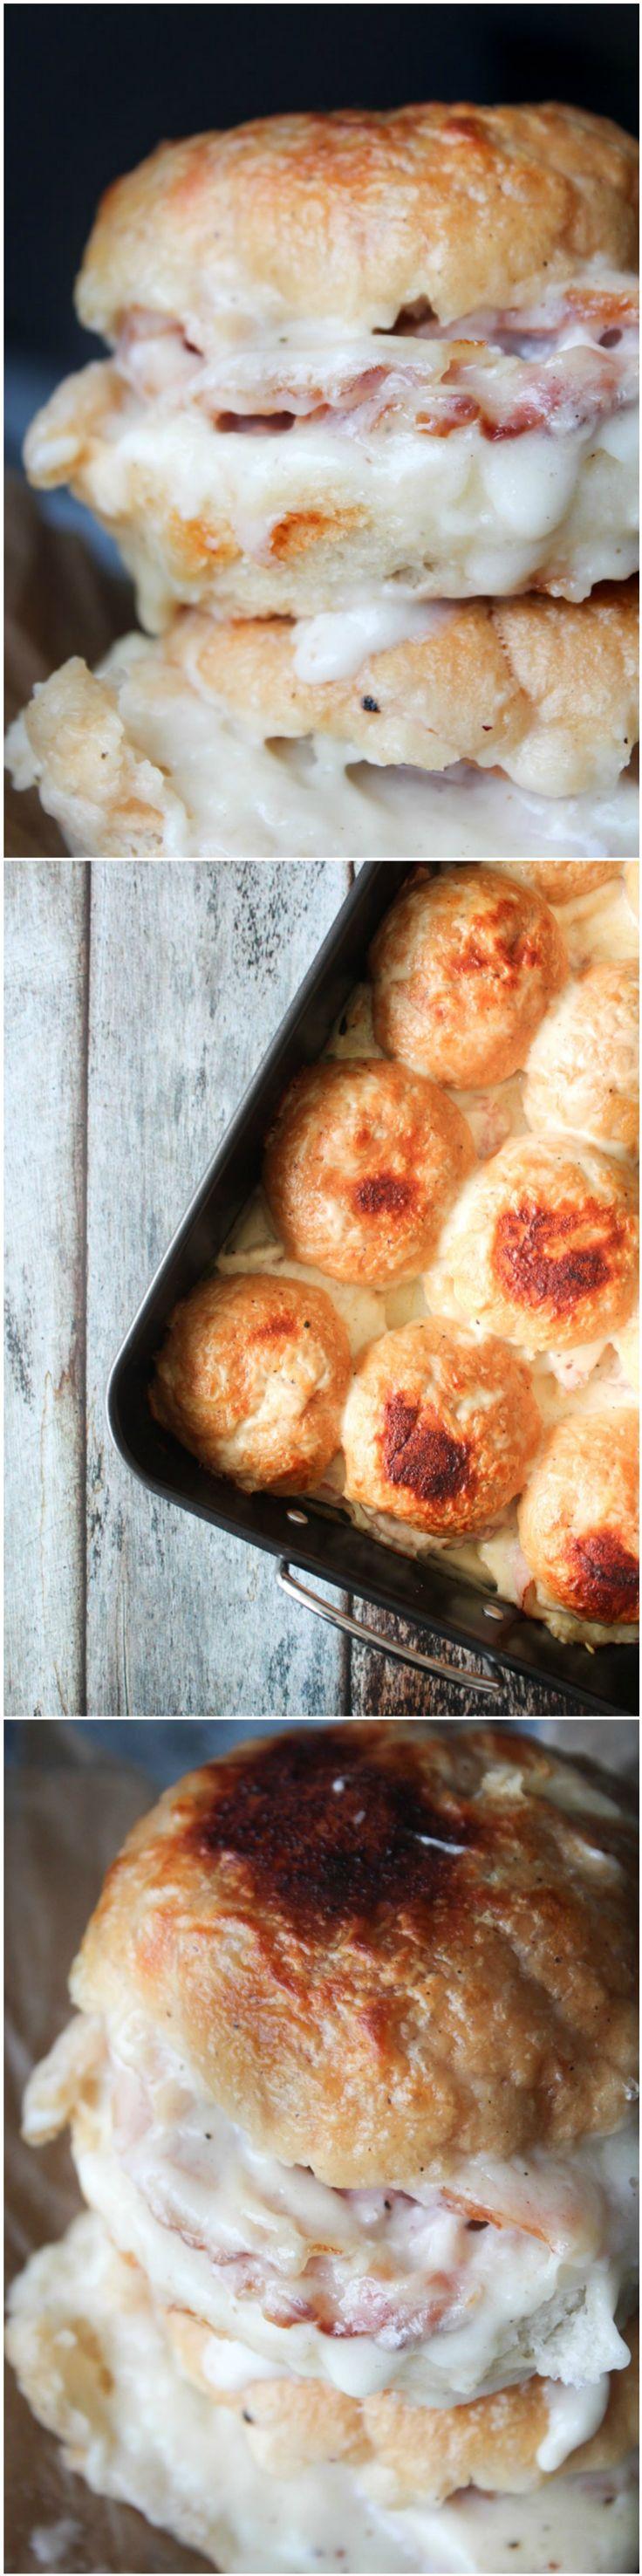 Homemde croque monsieur slider casserole - cheese and ham sliders - homemade casserole